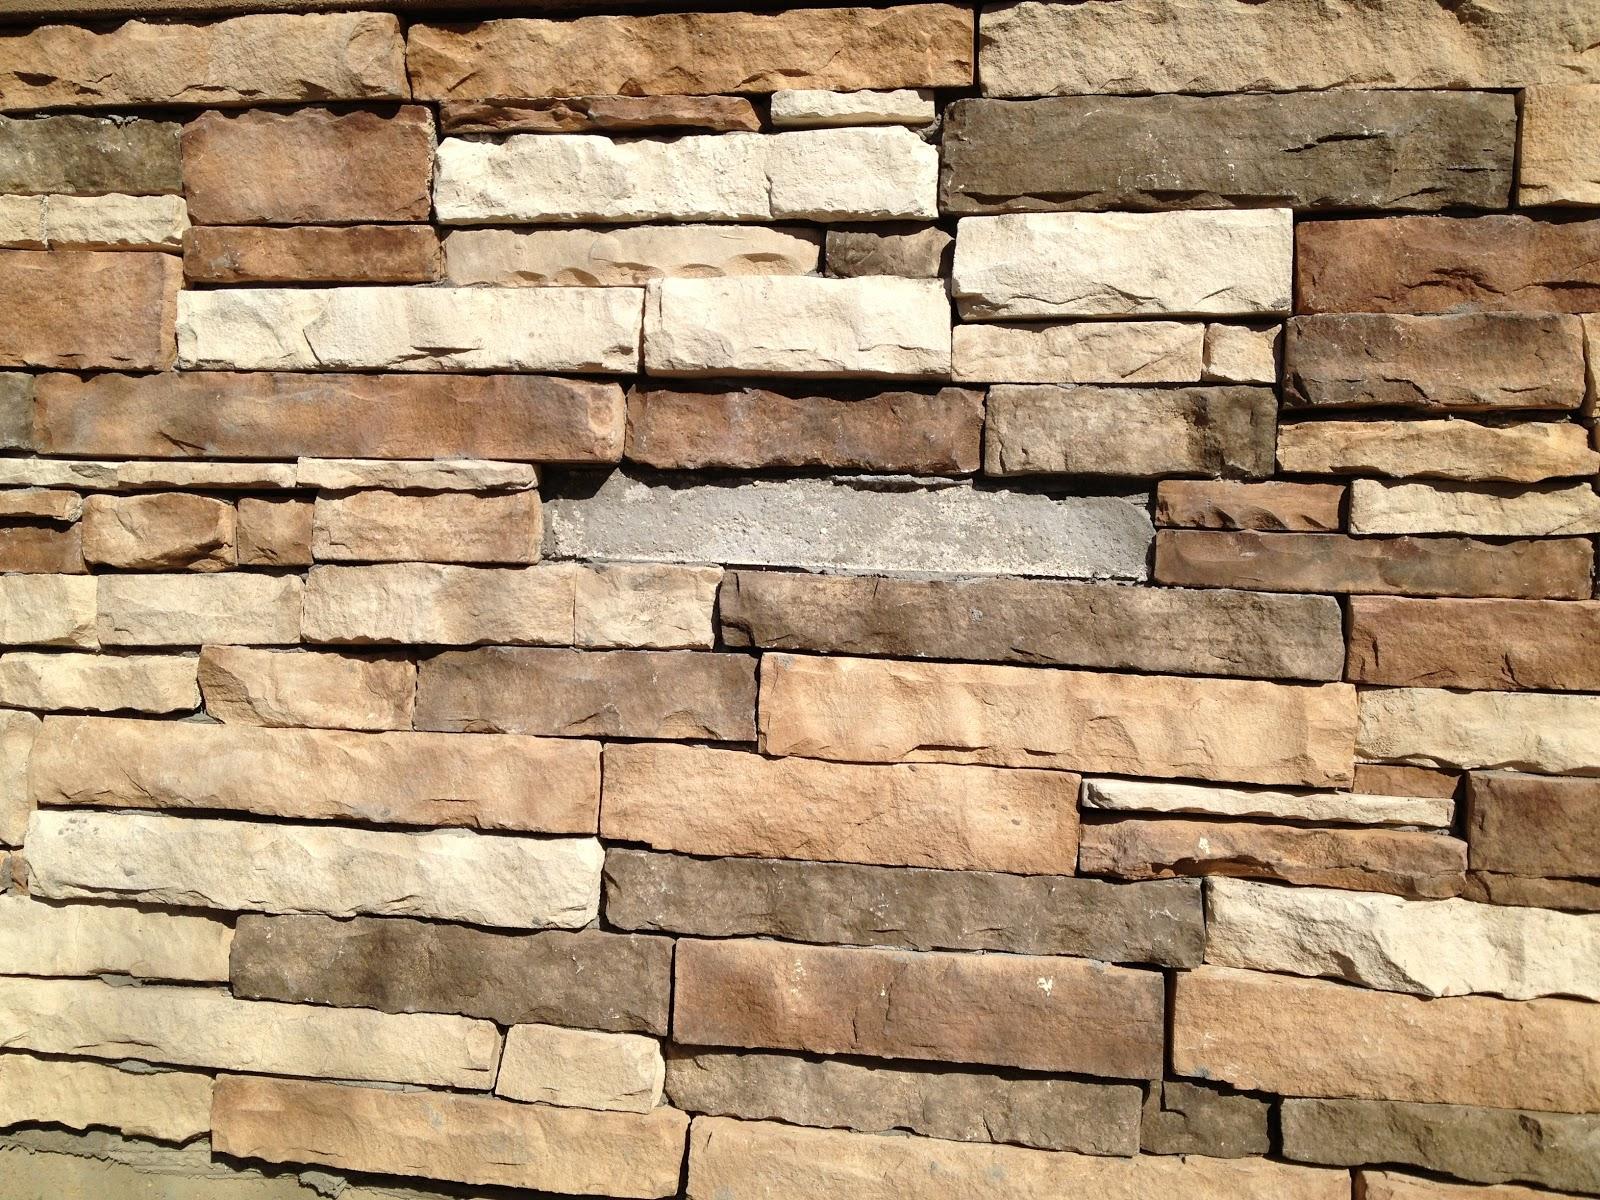 Laticrete conversations stone veneer problem for Glue on brick veneer